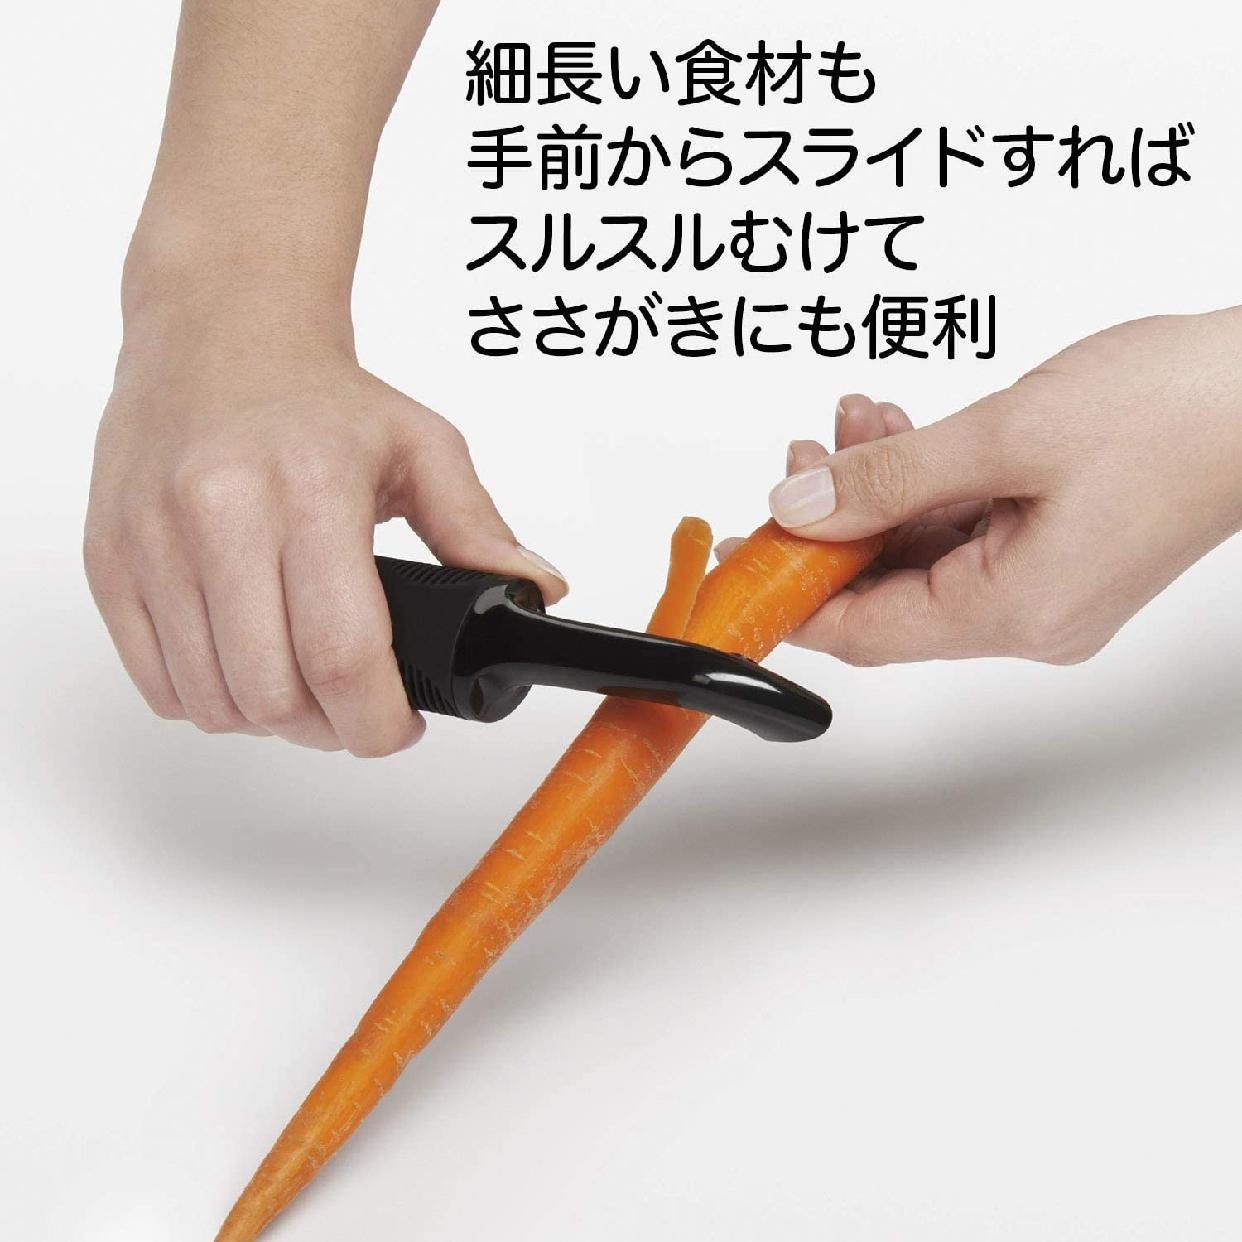 OXO たて型ピーラーの商品画像3